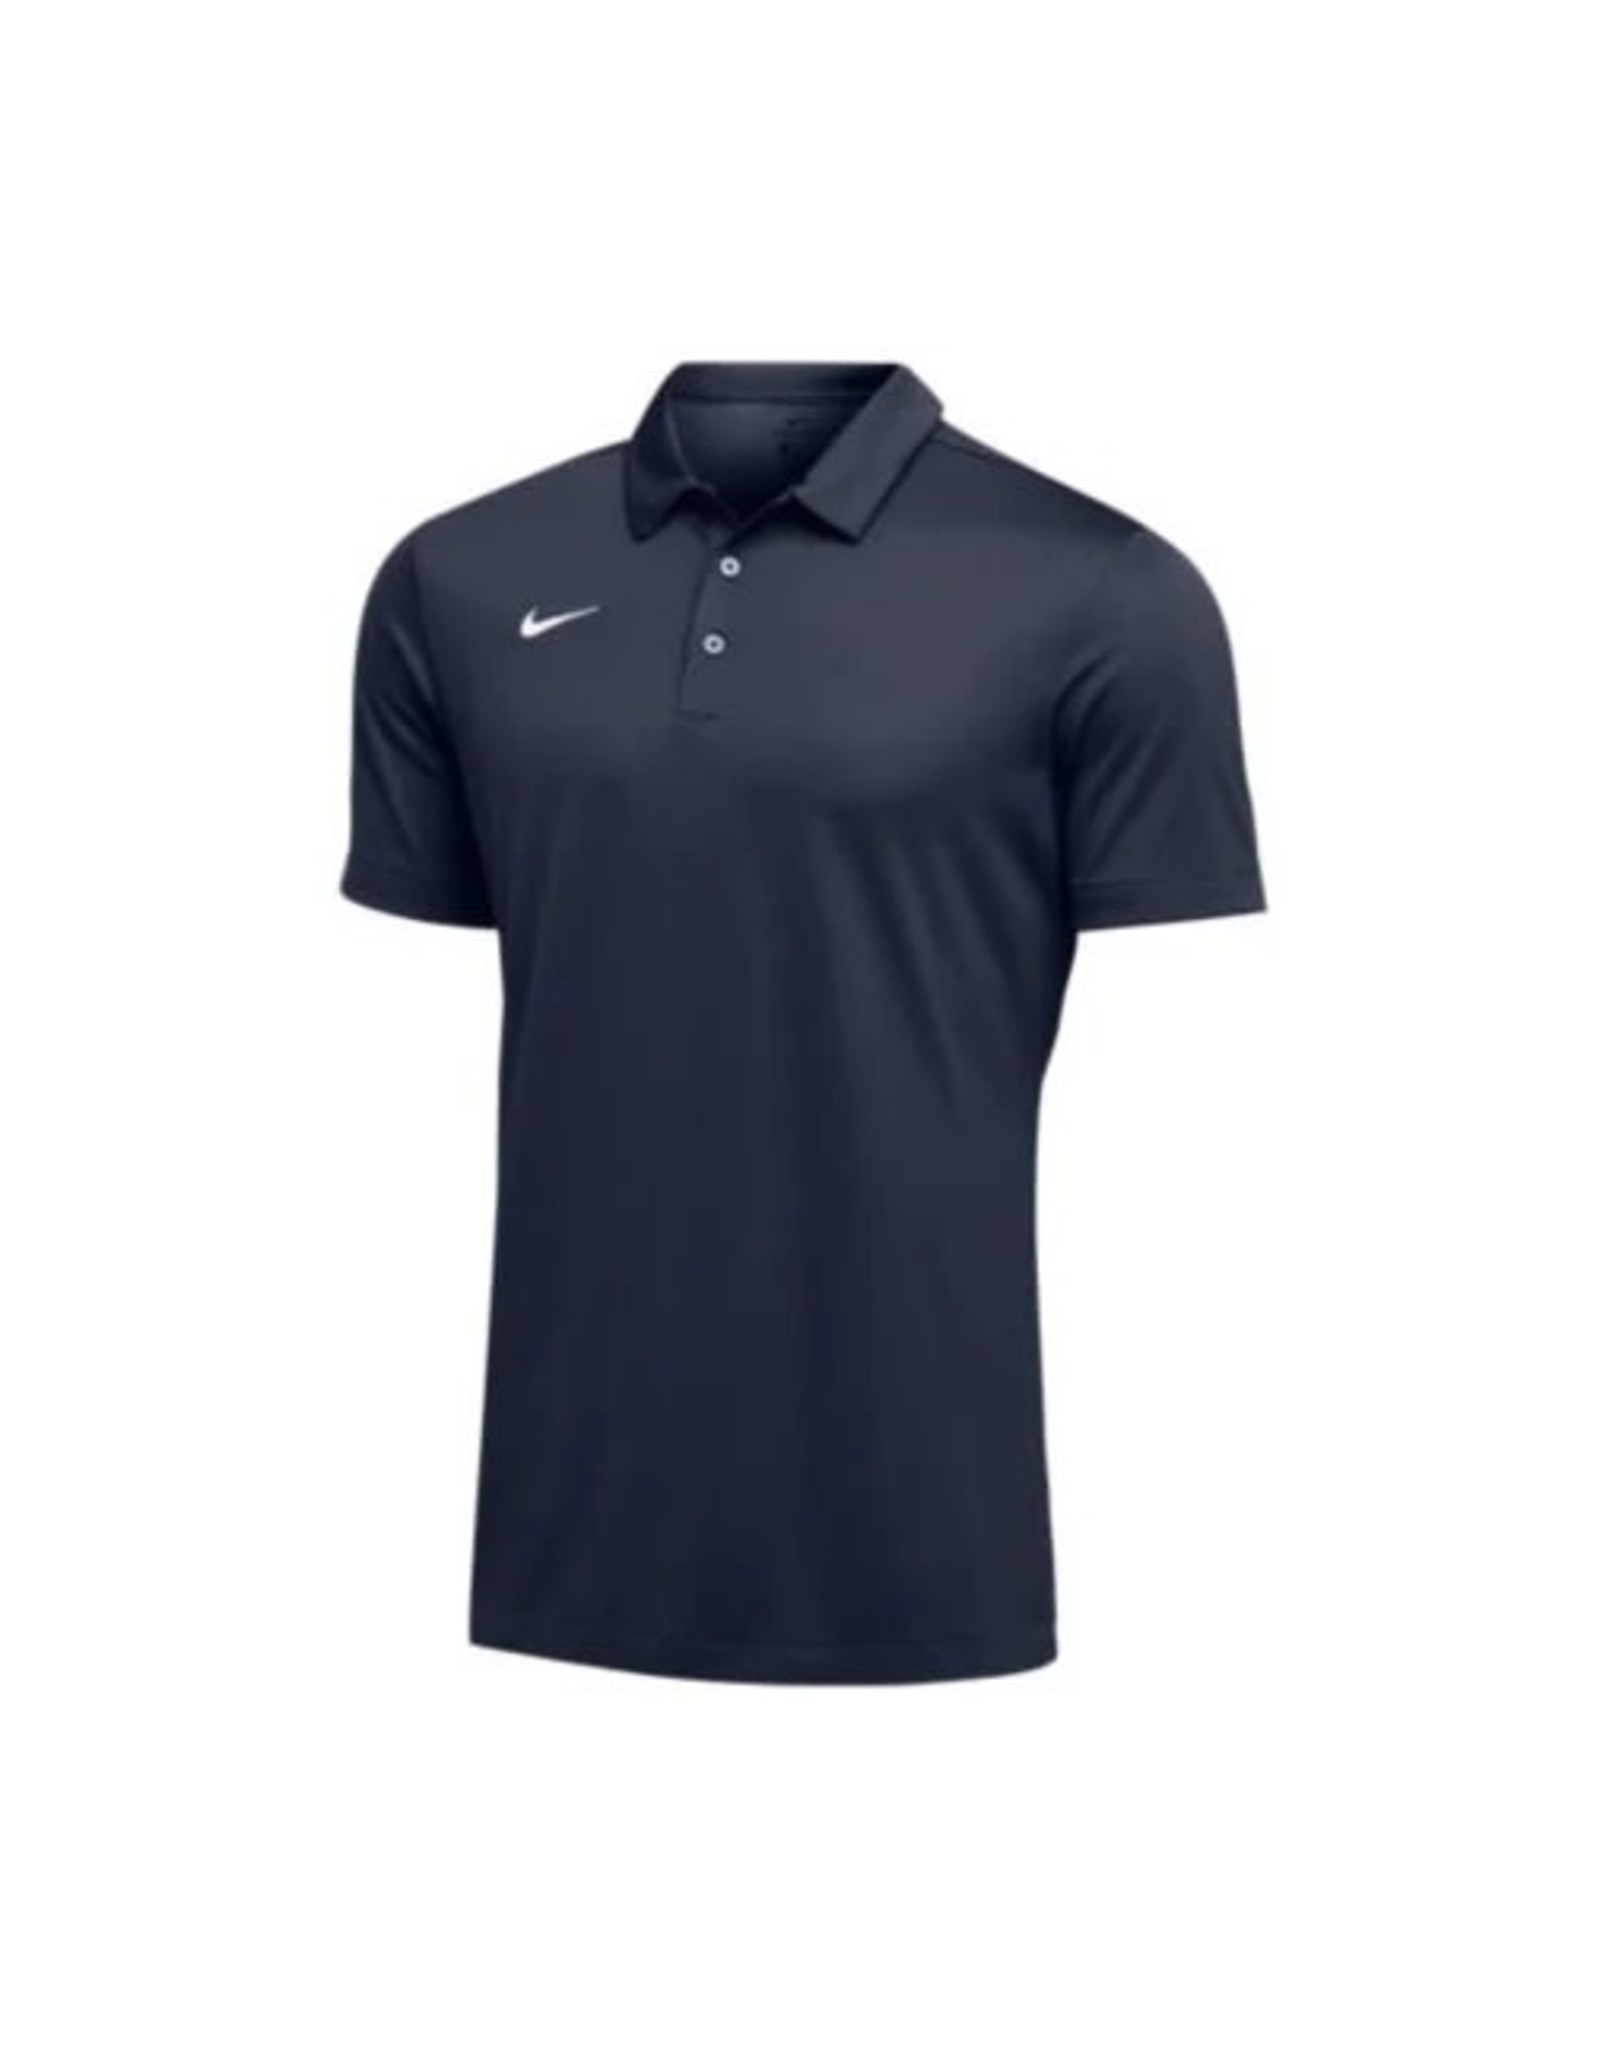 NON-UNIFORM Nike Custom Team S/S Dri-Fit Polo, mens/unisex